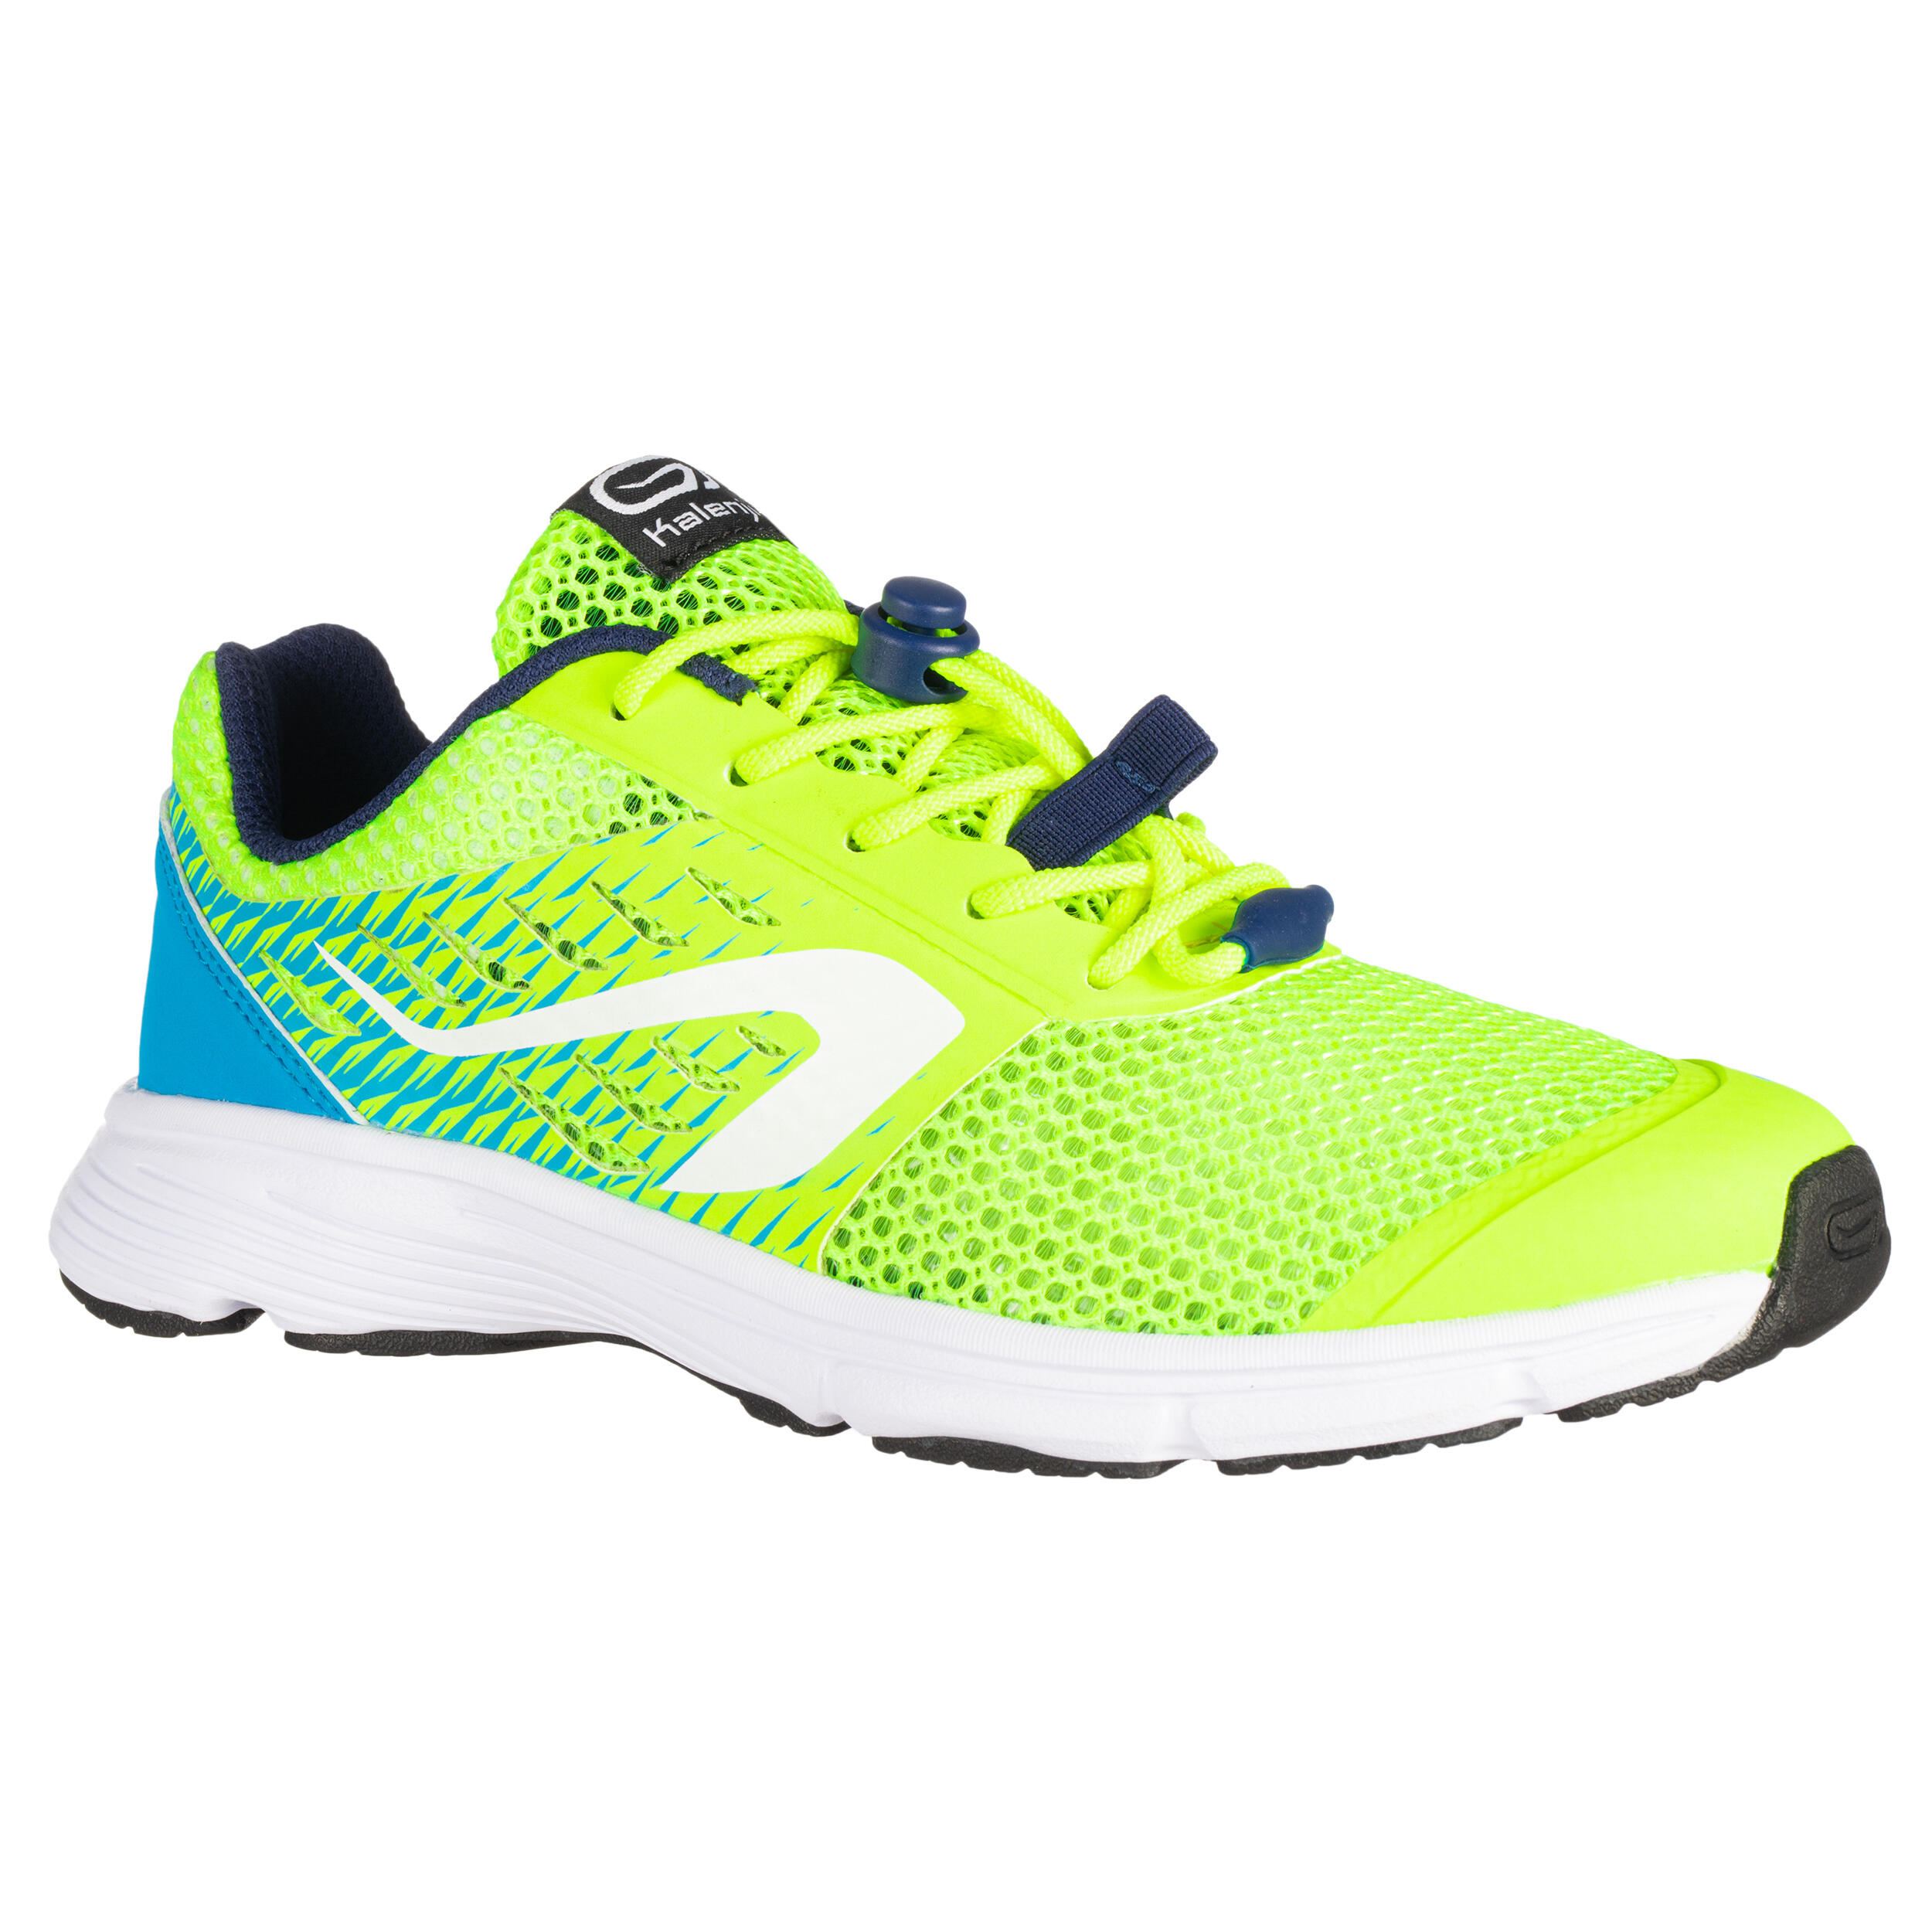 Junior \u0026 Kids Running Shoes | Decathlon